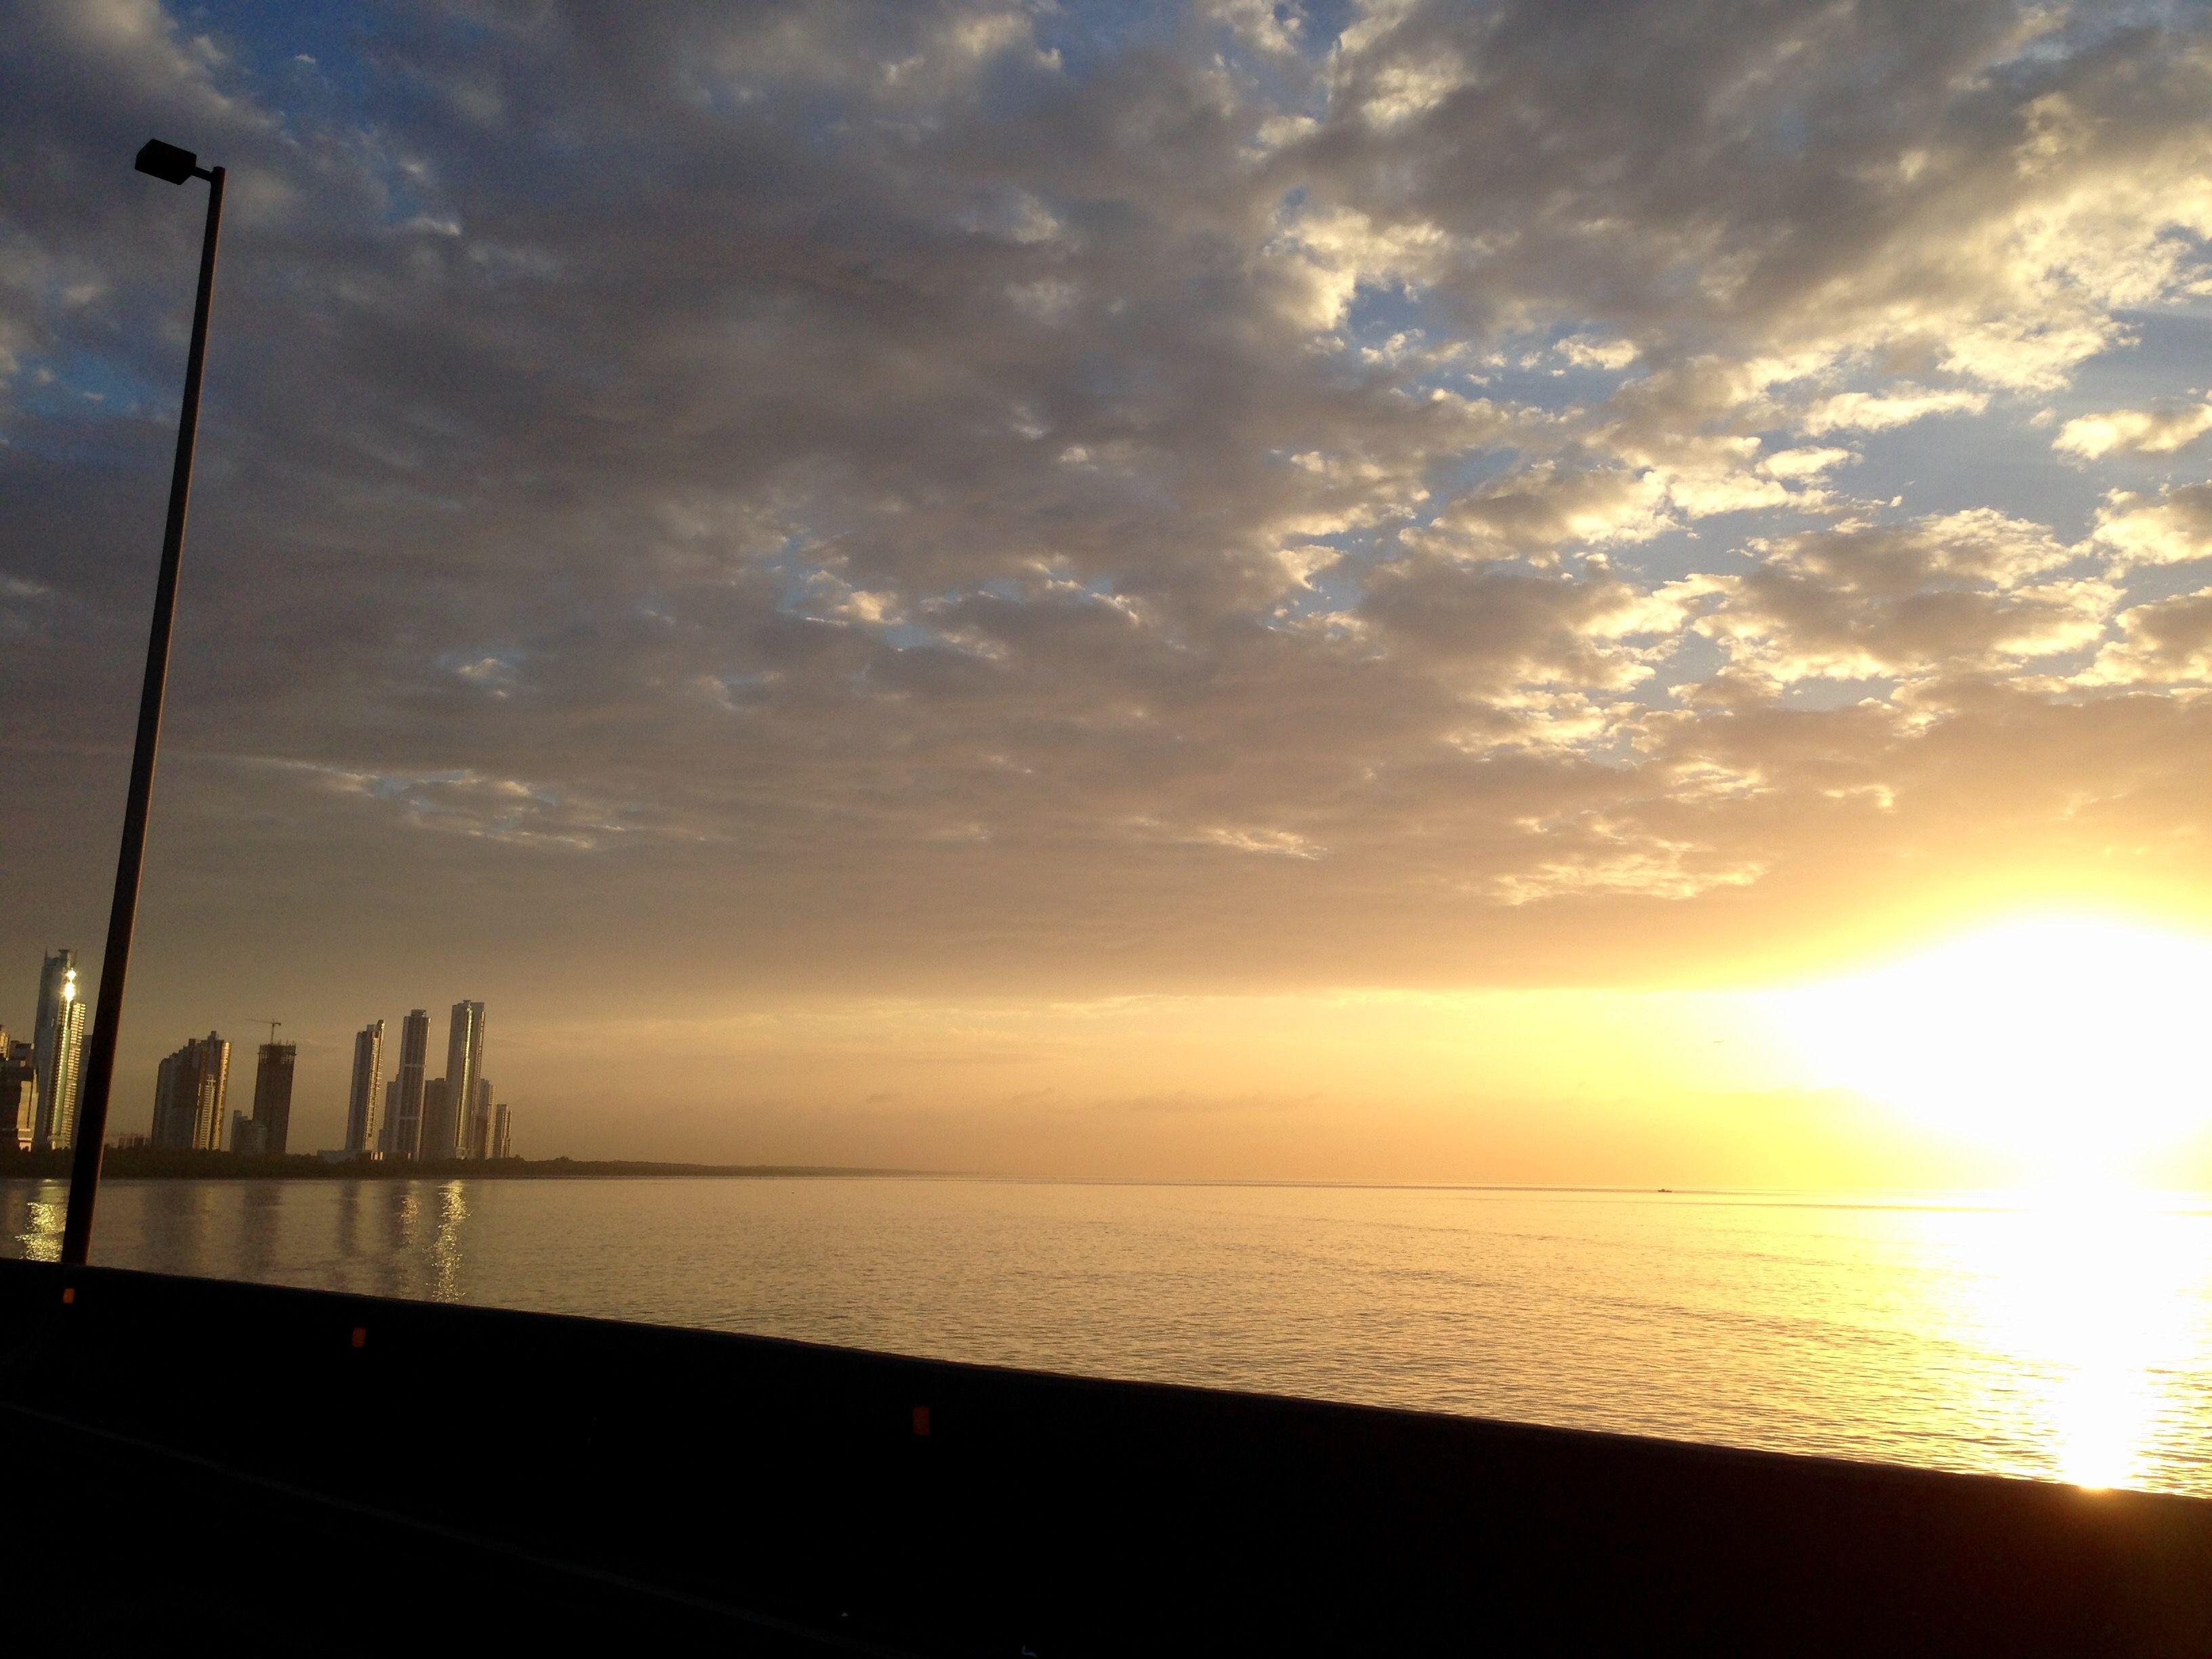 Panamá sunrise